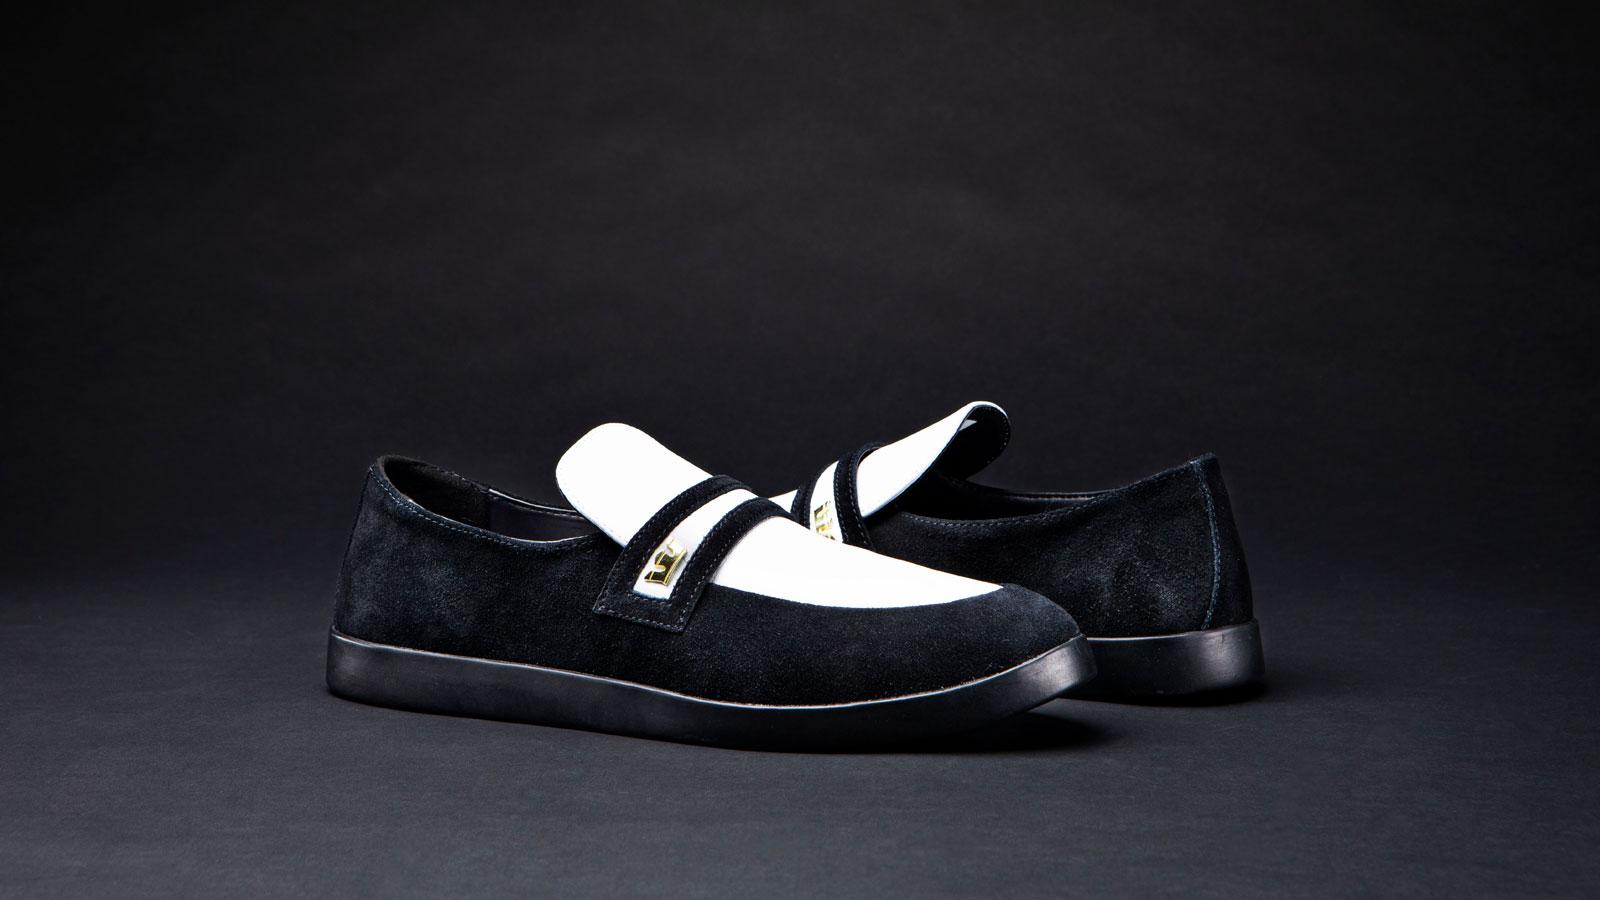 18dbb9508d4d SUPRA FW19 20 Men s Skate Shoes Preview - Boardsport SOURCE